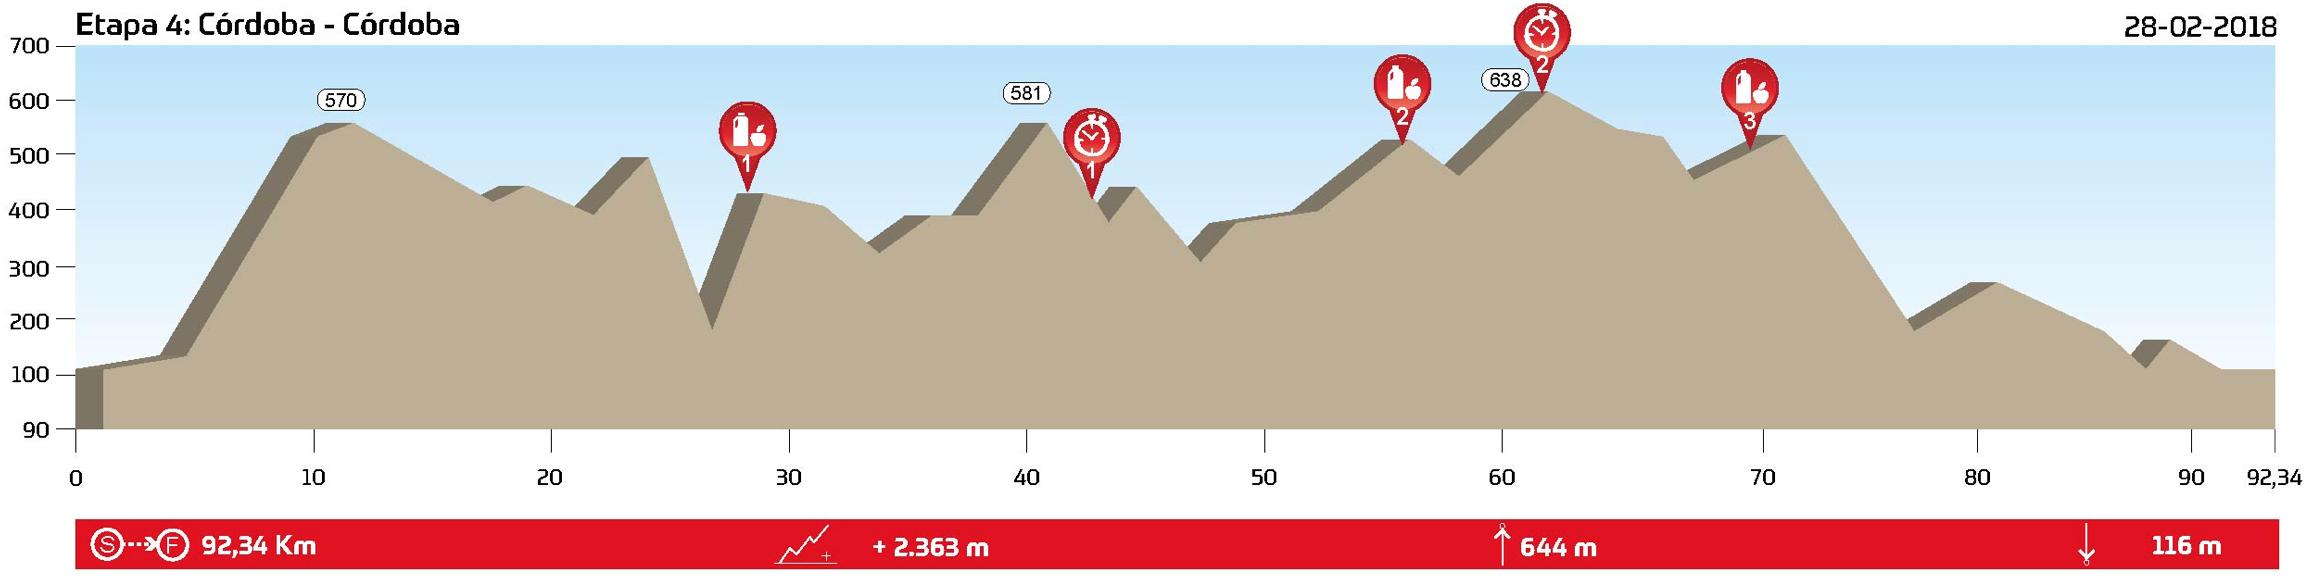 etapa 4 Andalucía bike race perfil